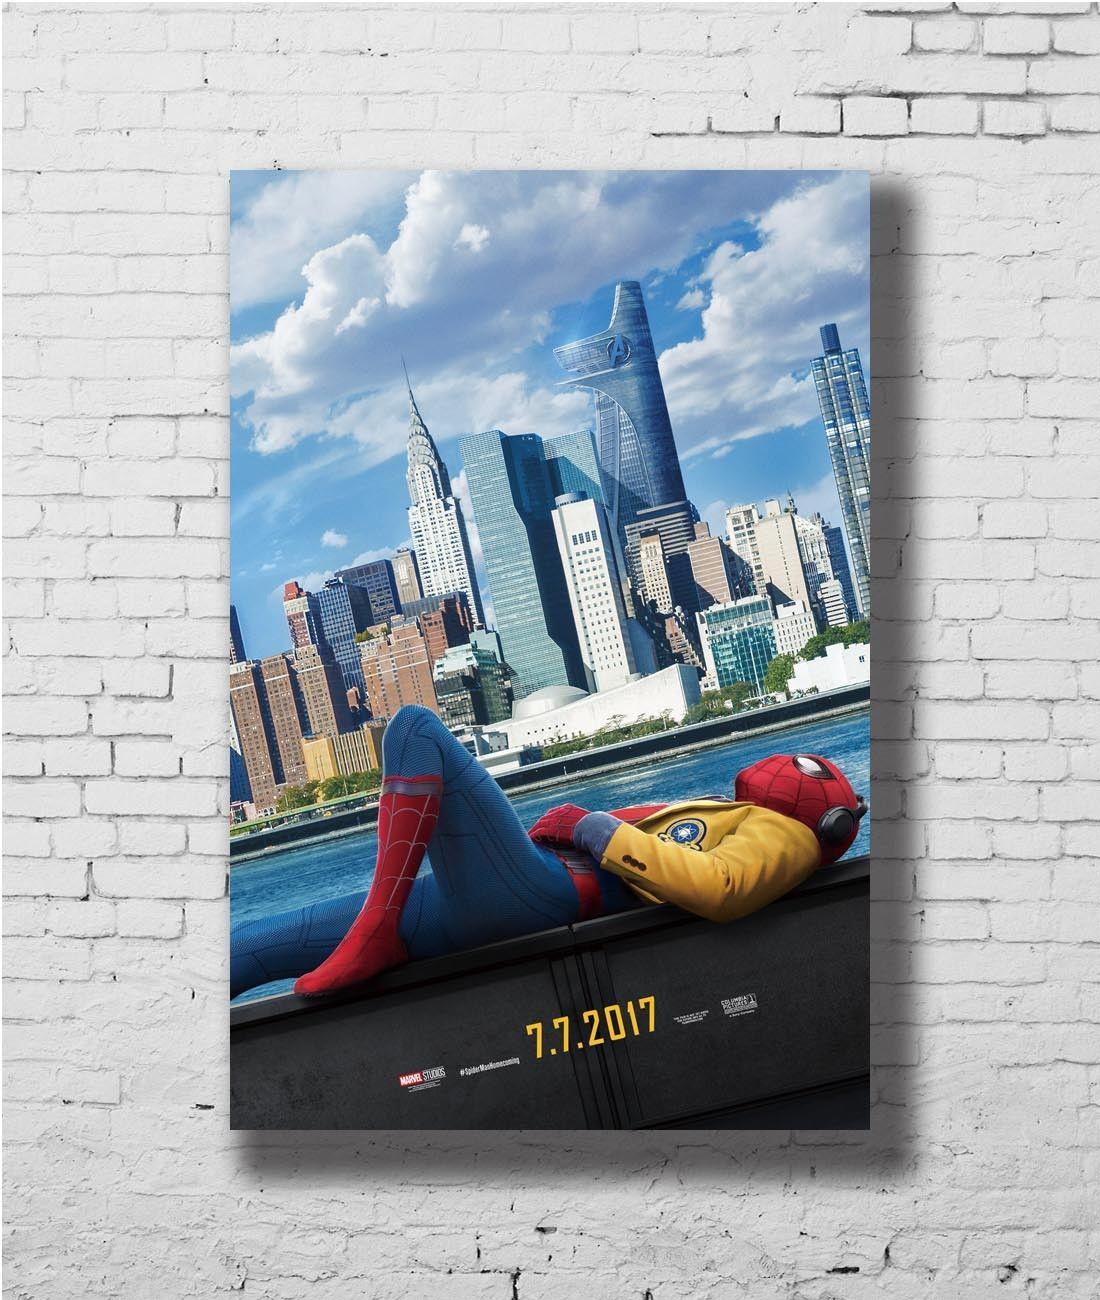 Carteles e impresiones Q0932 24x36 14x21 40 Spider-Man Homecoming película 2017 caliente Póster Artístico de lienzo pintura decoración del hogar